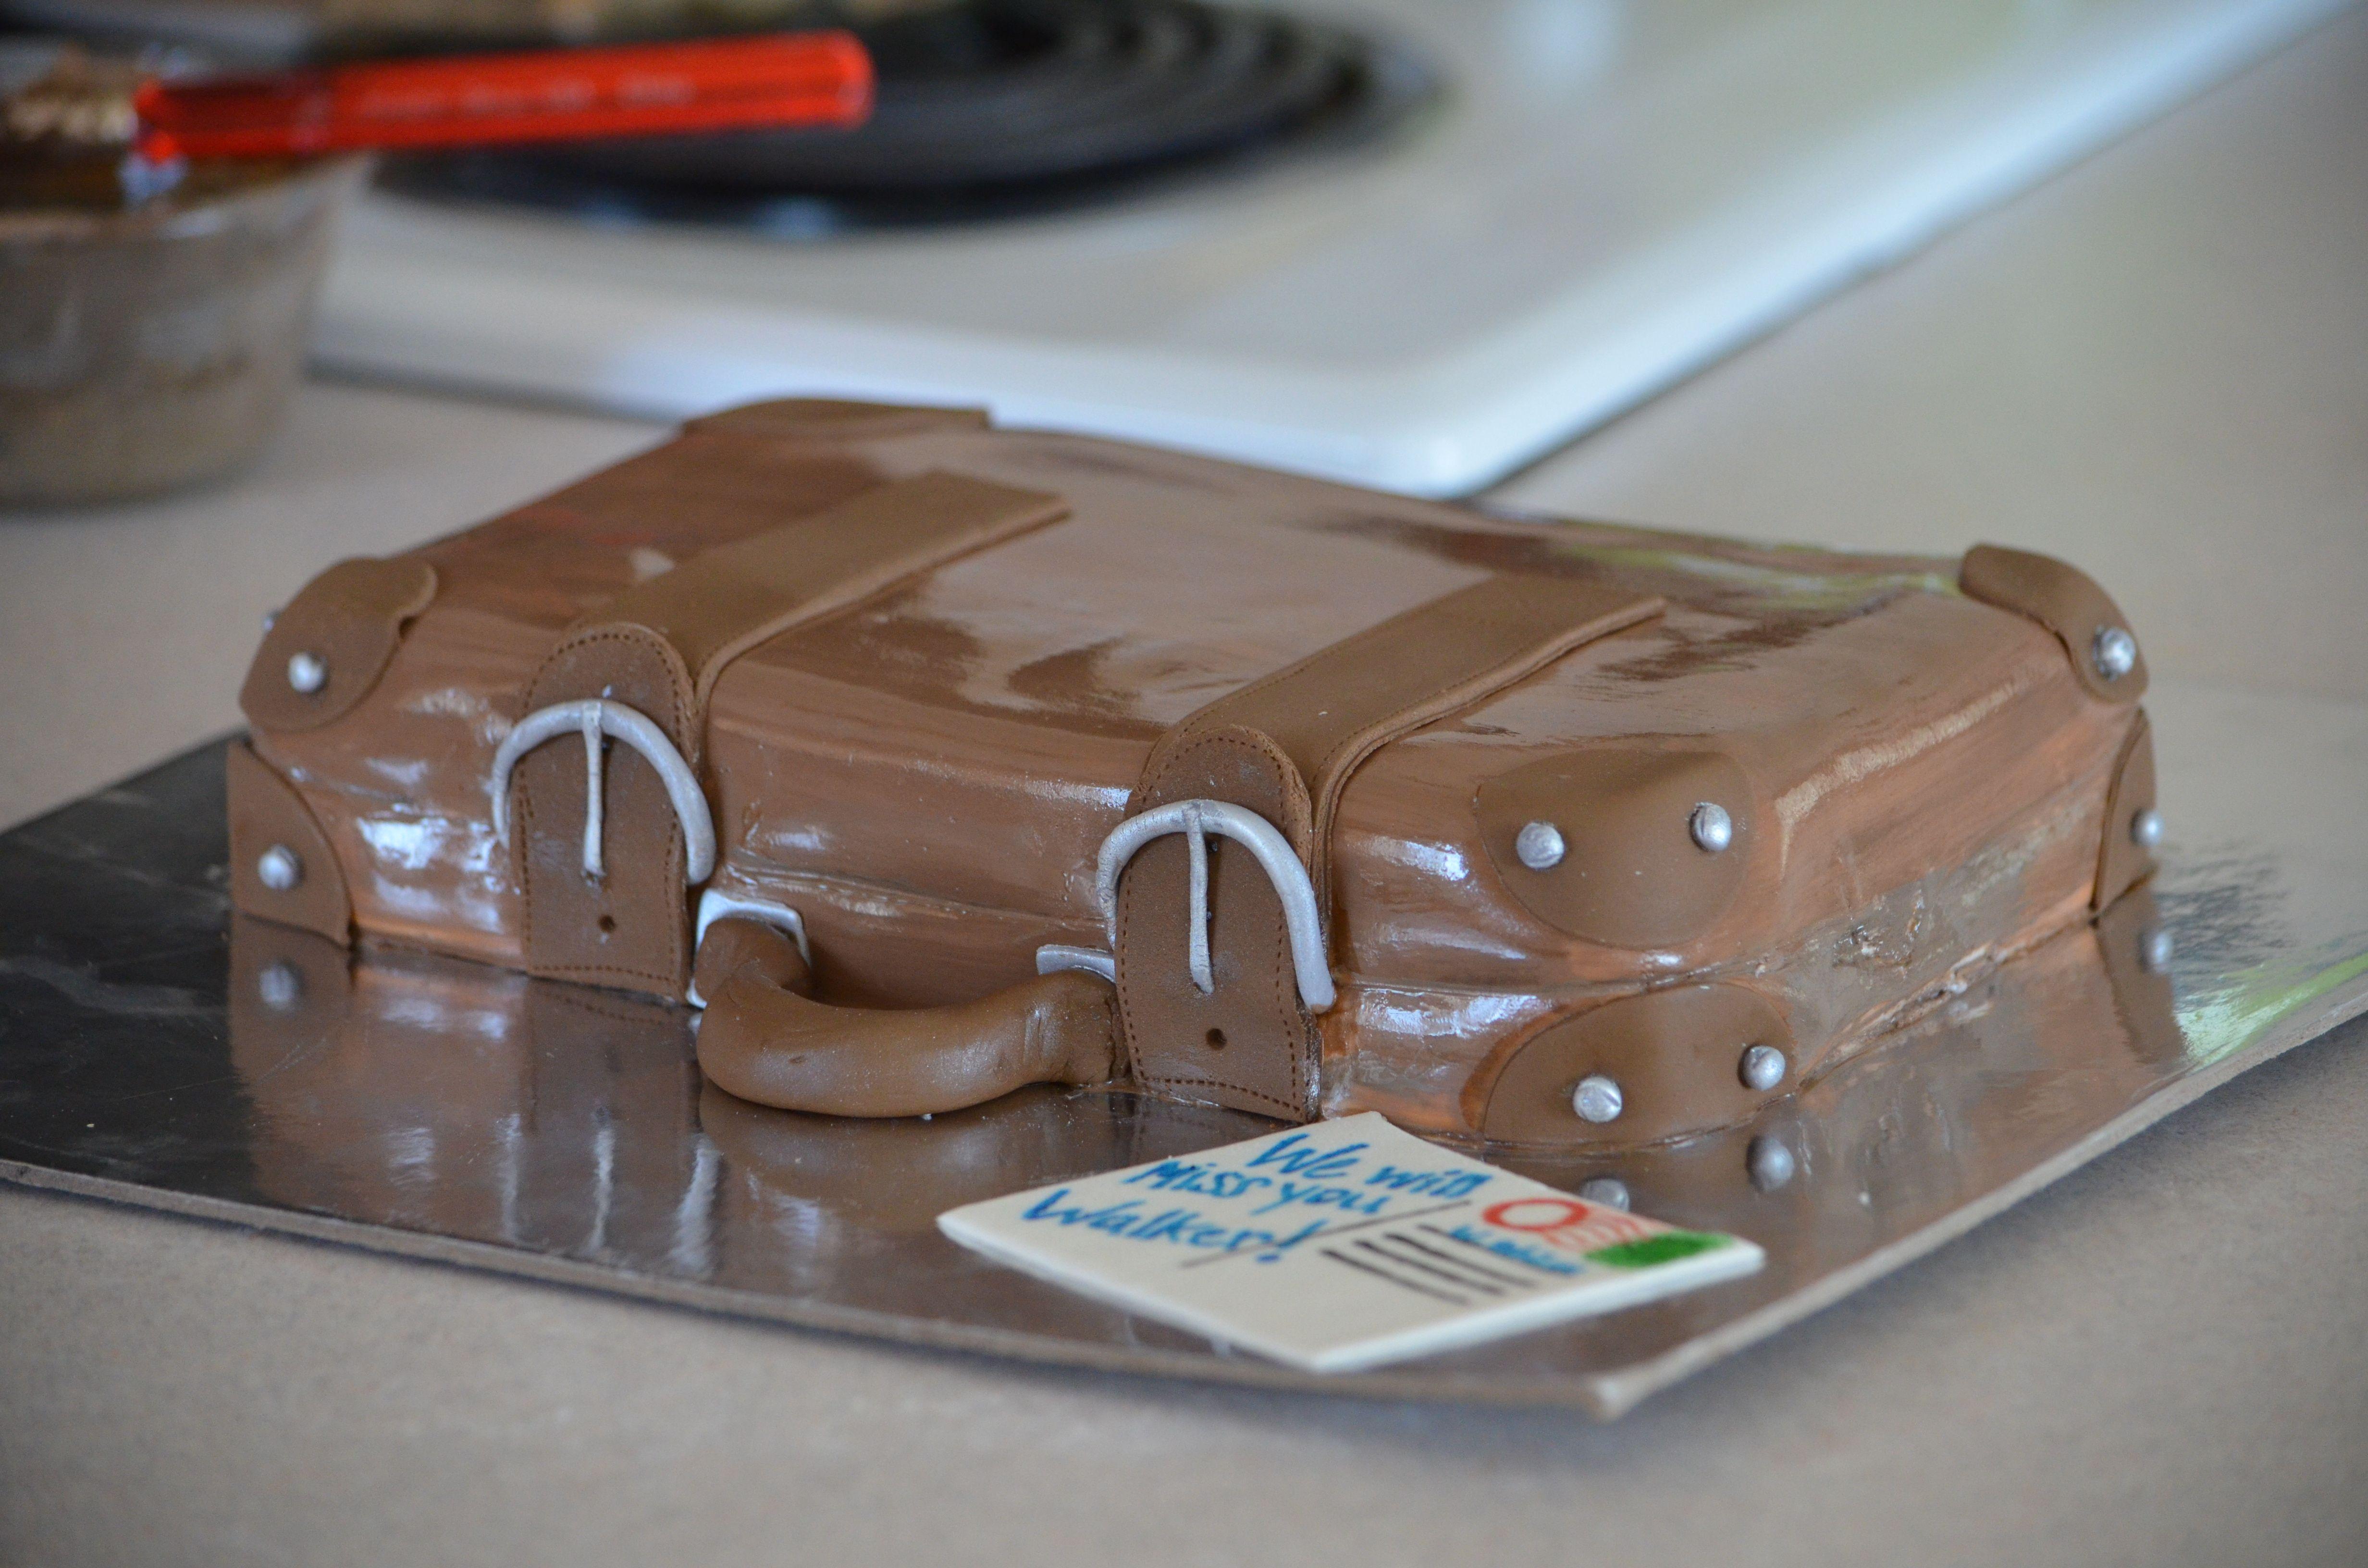 mini Suitcase cake. Going away cake